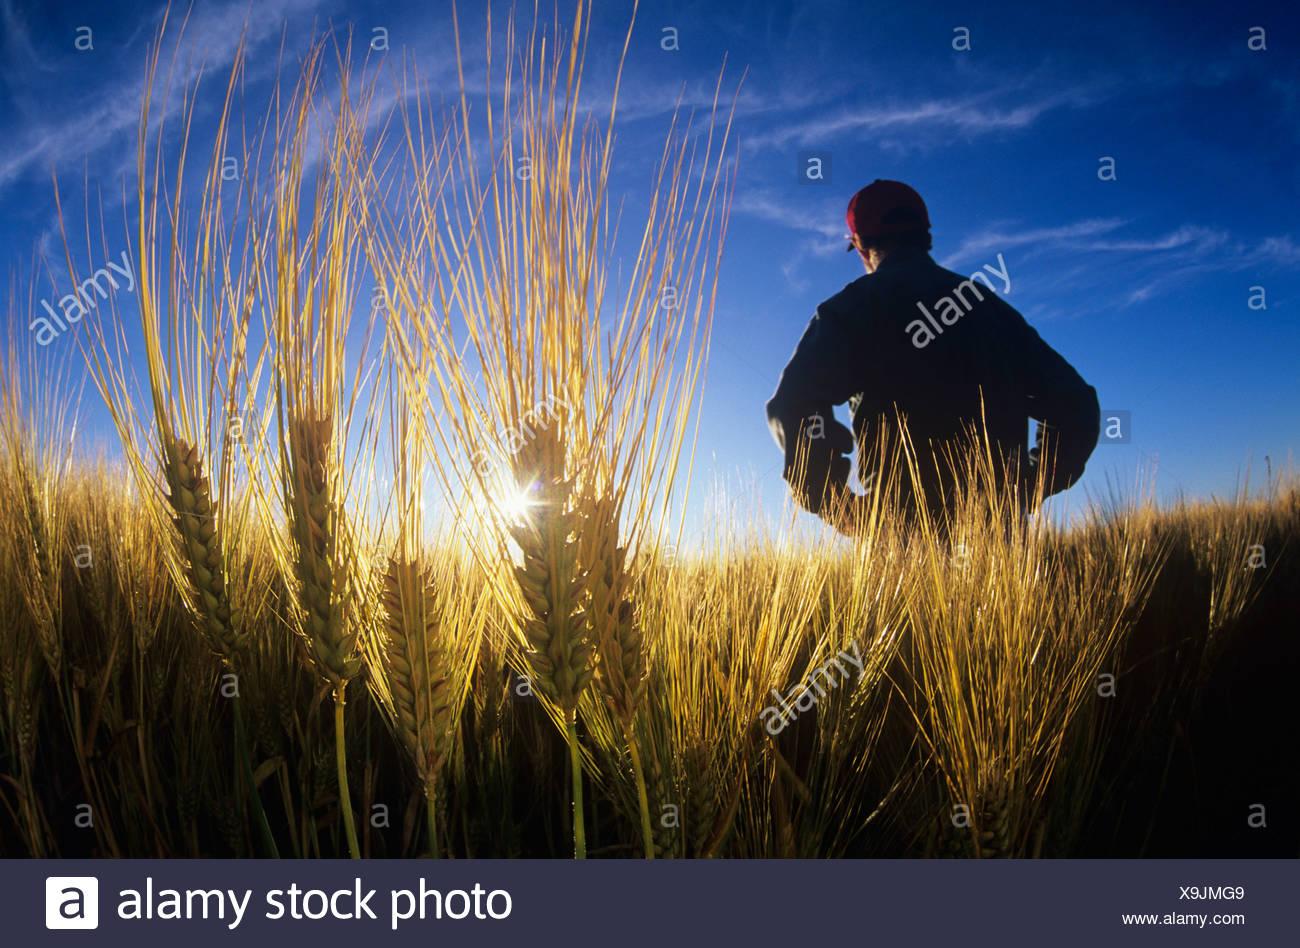 Farmer in maturing barley field, Dugald, Manitoba, Canada. - Stock Image